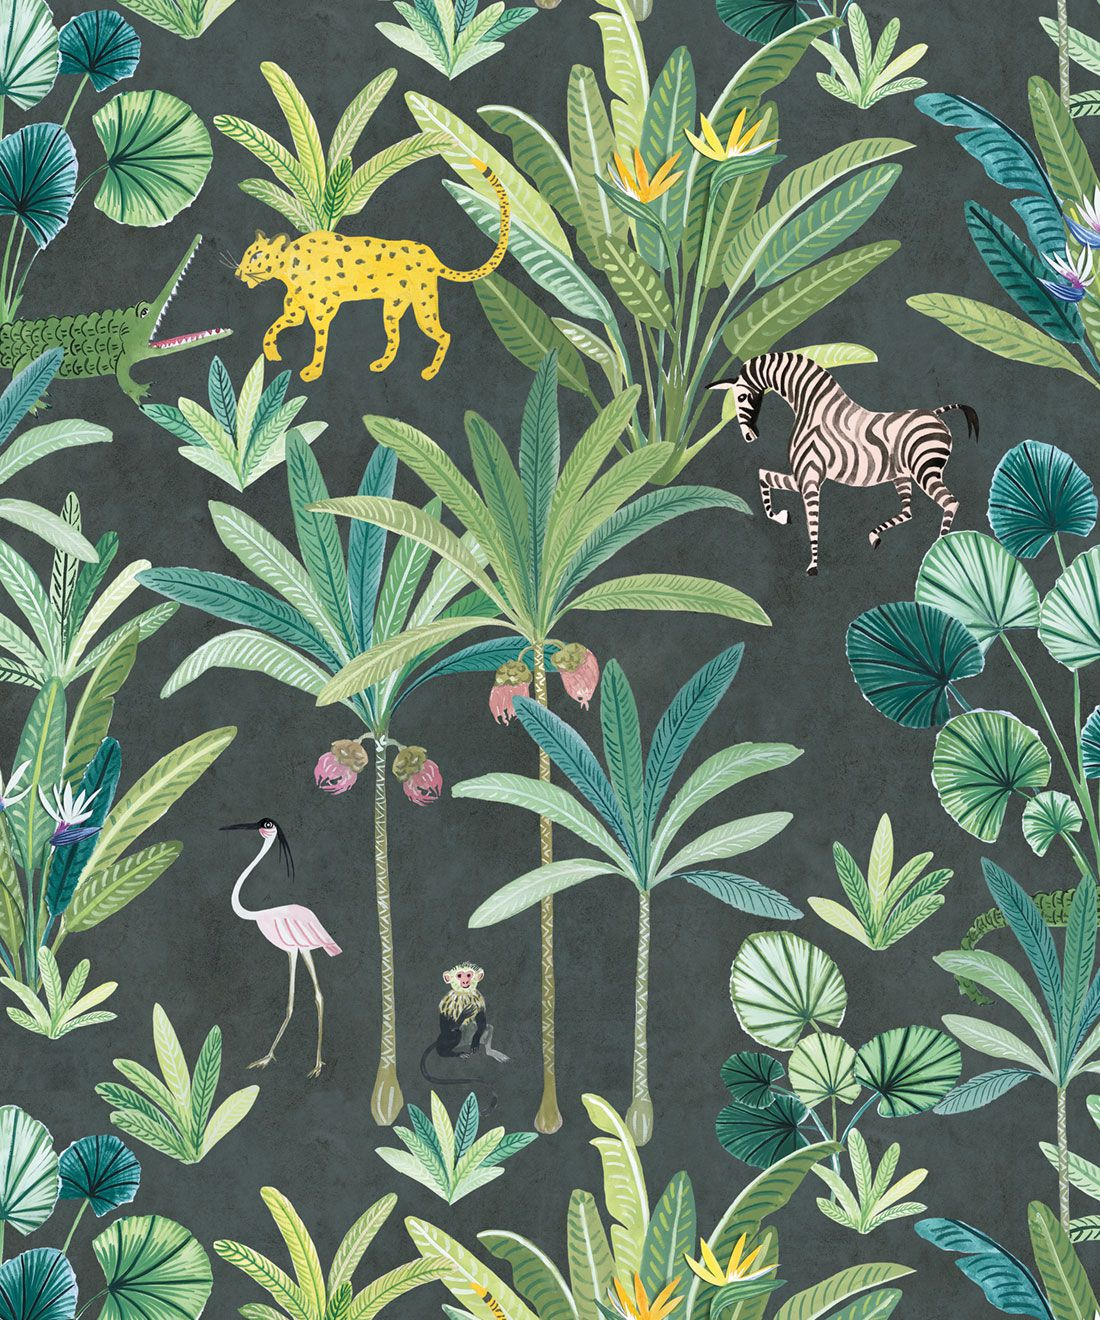 Animal Kingdom Wallpaper (Two Rolls)